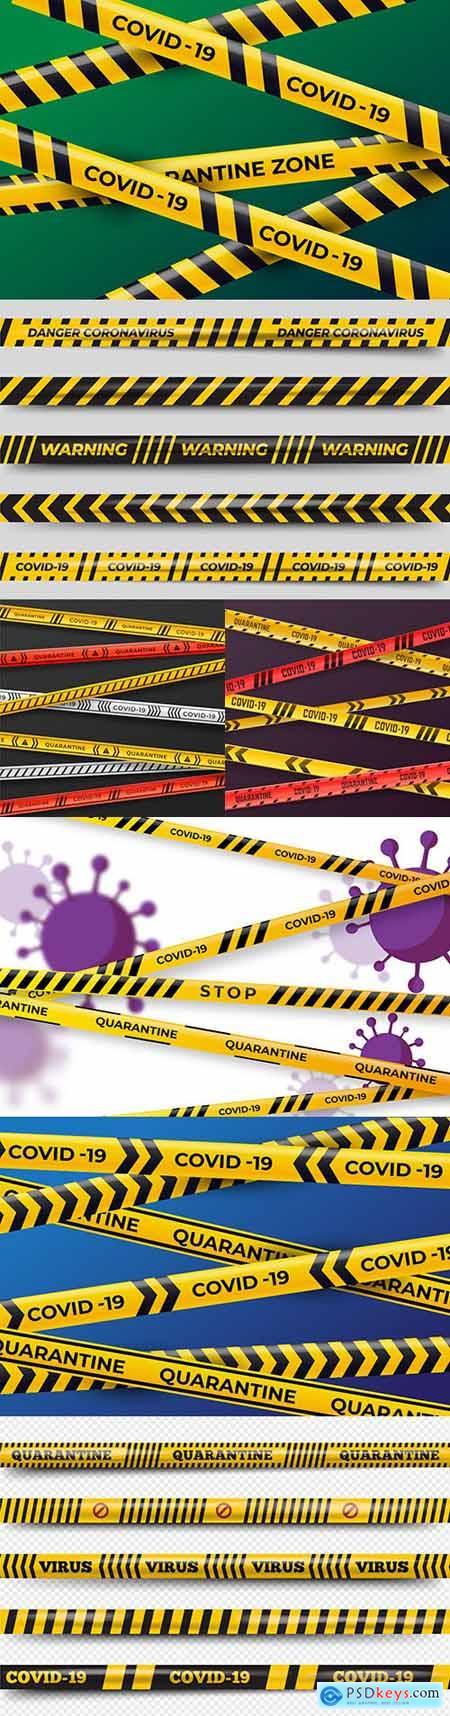 Realistic quarantine strips coronavirus covid-19 illustration